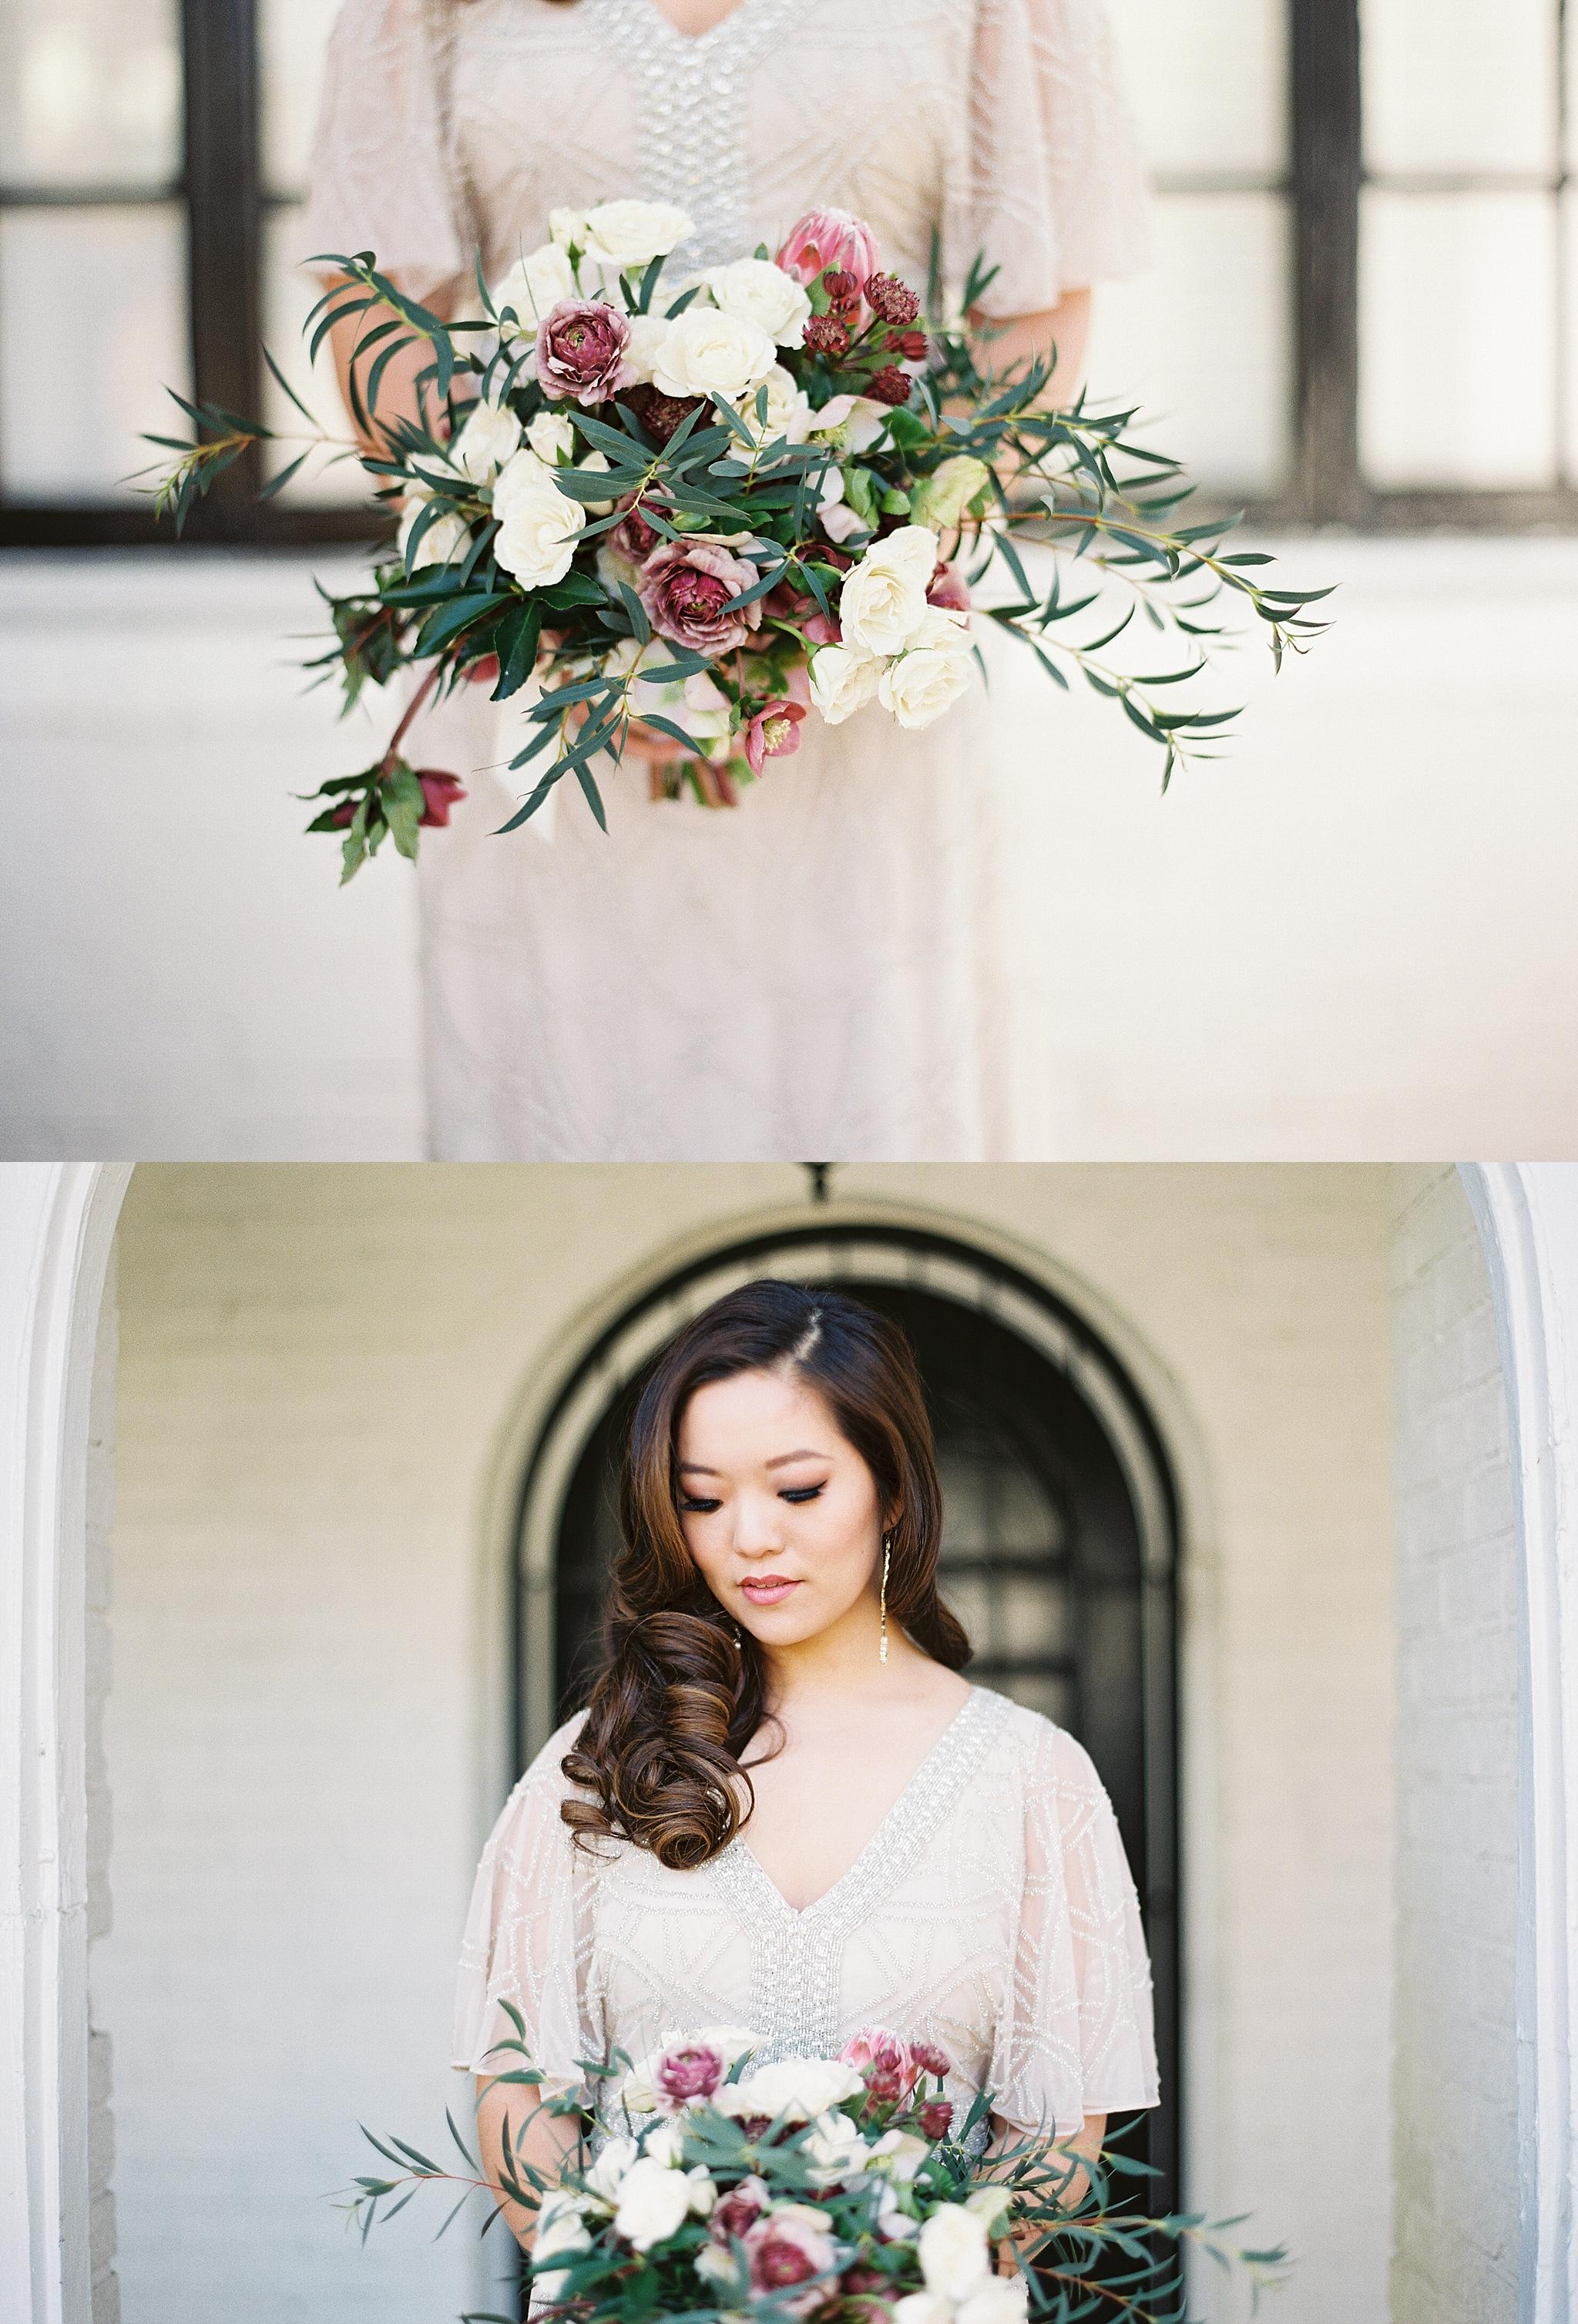 kate-hillstead-bride-bouquet